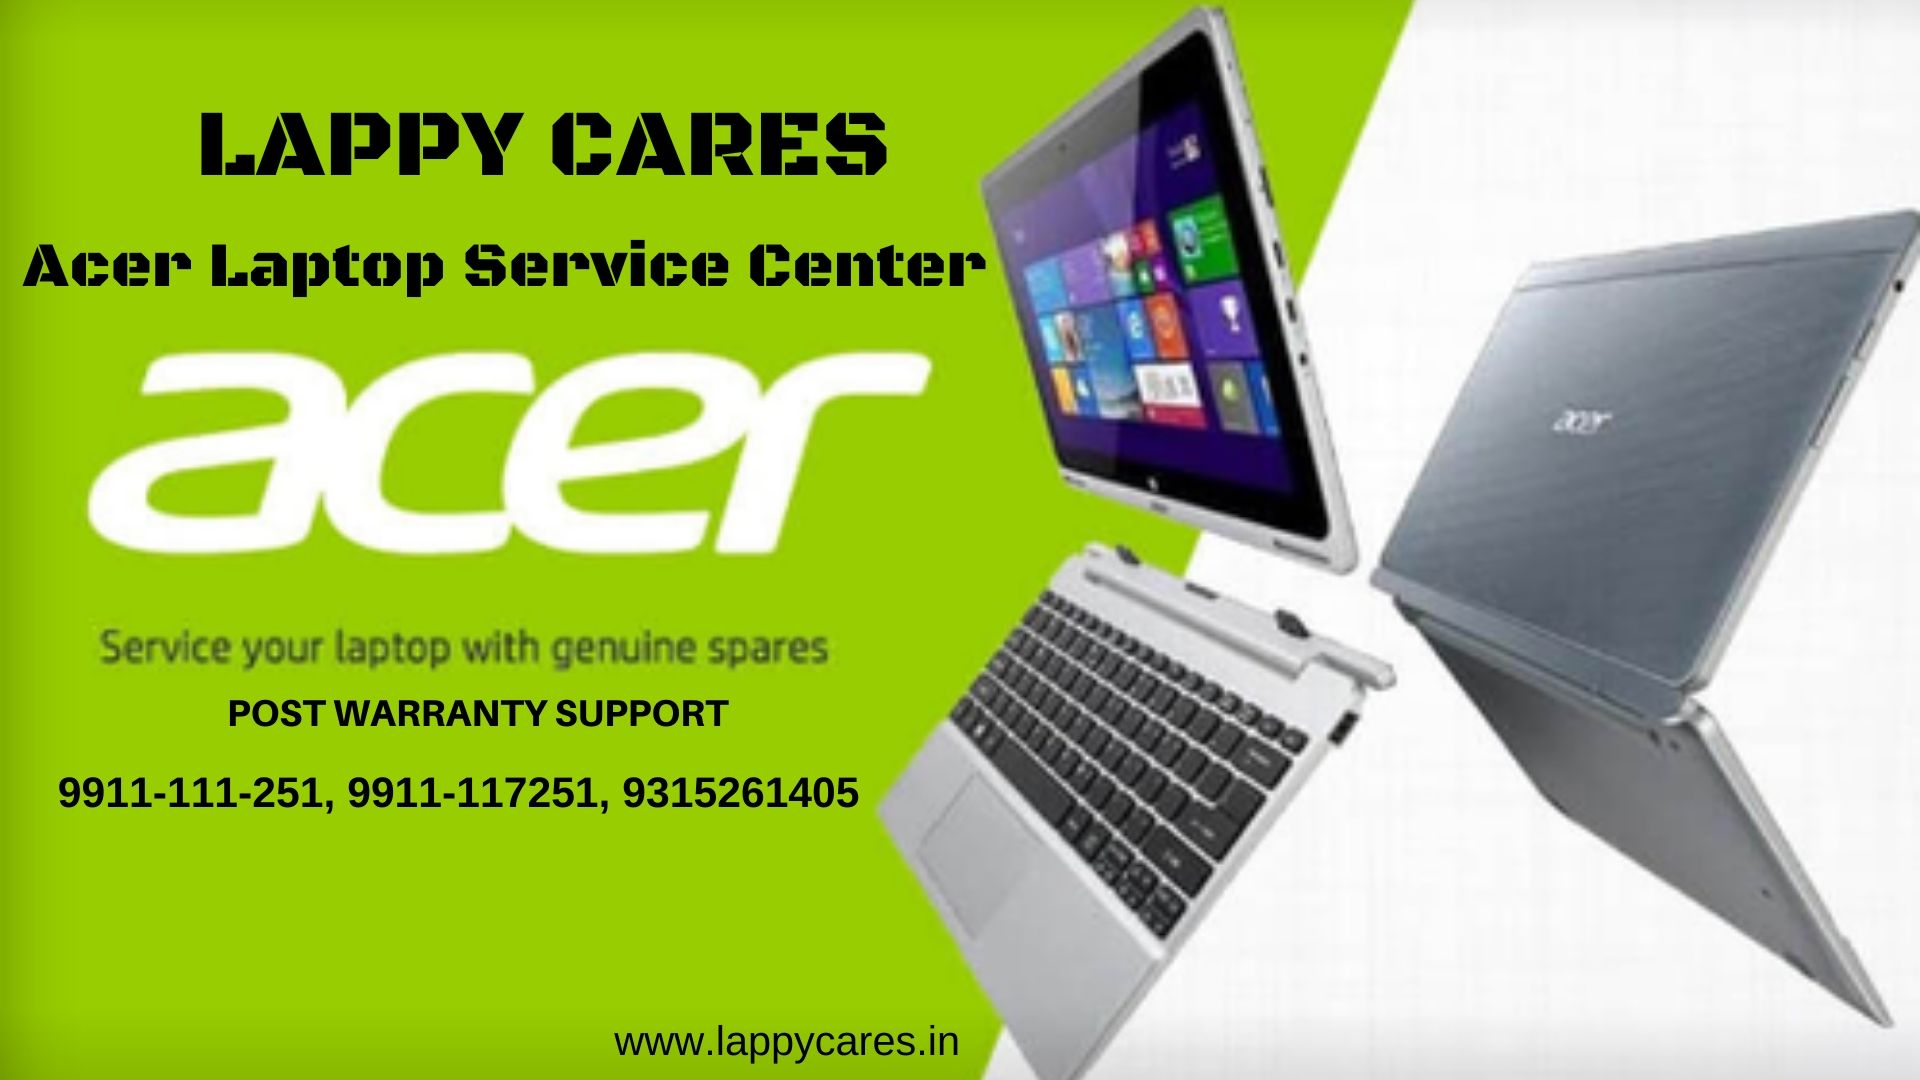 Acer Laptop Service center in Dwarka 9911 117 251